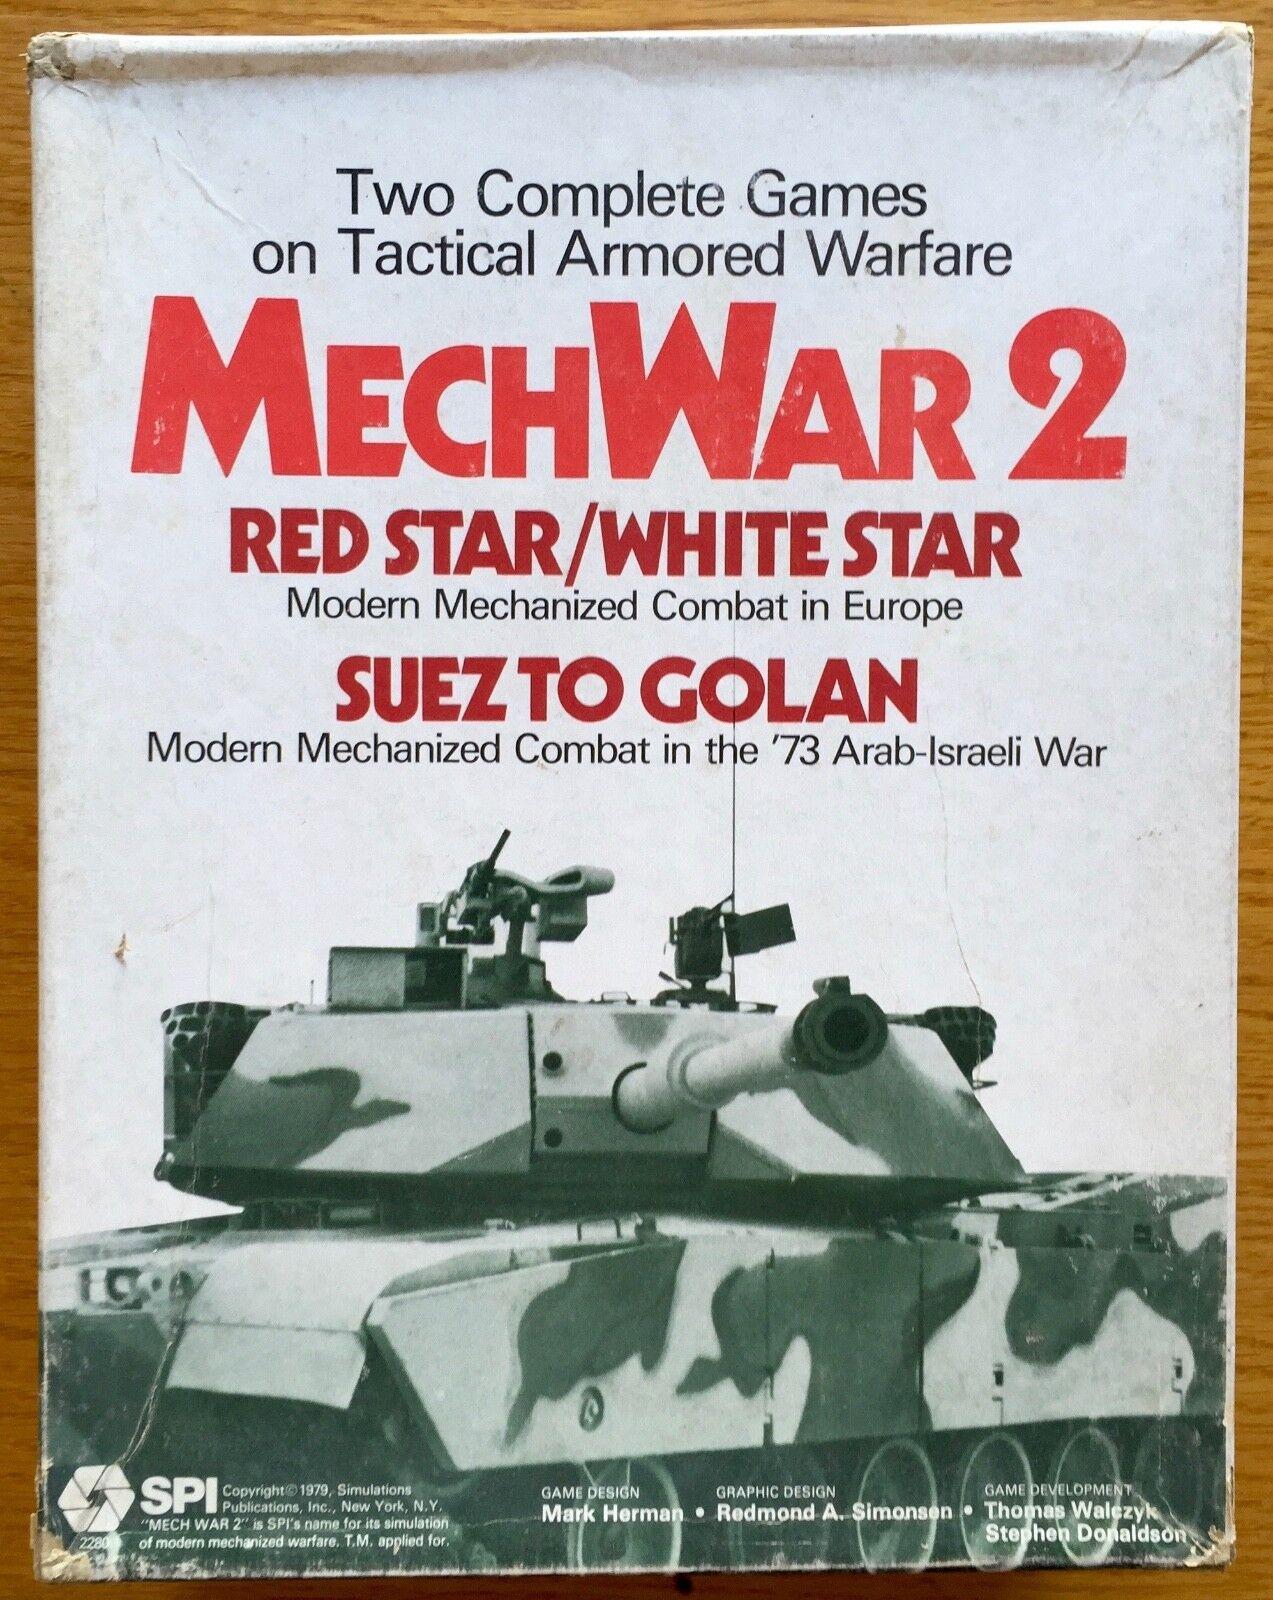 MechWar 2 - rosso Star bianca Star - Suez To Golan - SPI 1979 - Ottimo - UNPUNCHED